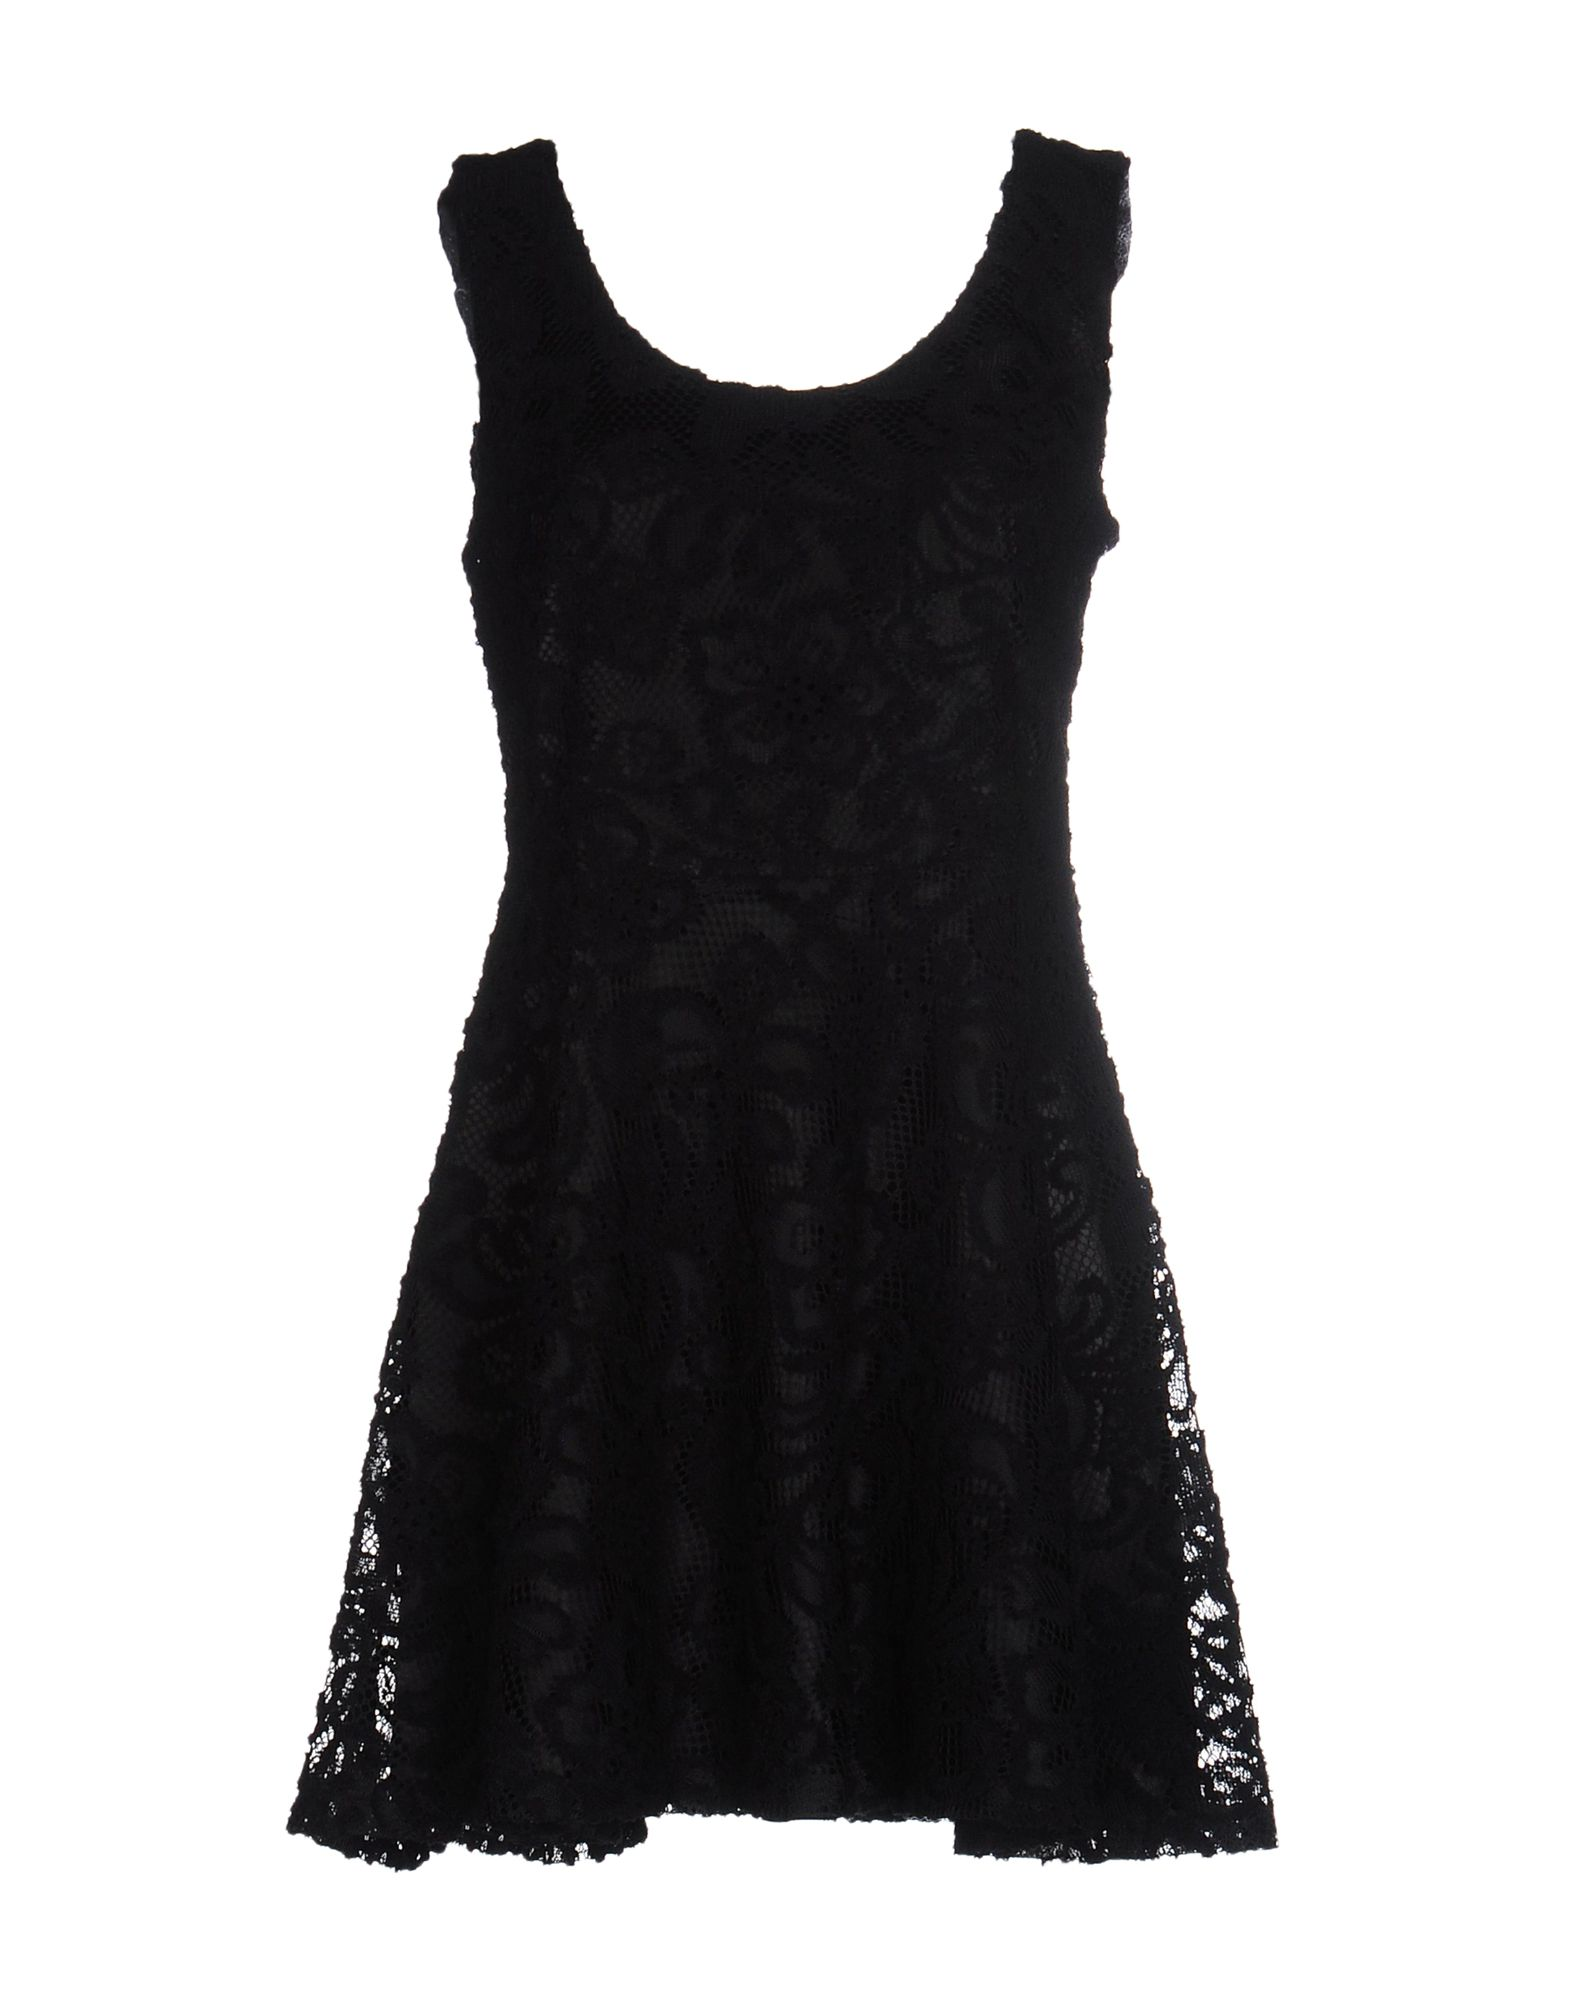 VITTORIAGIRL by VITTORIA ROMANO® Короткое платье цены онлайн